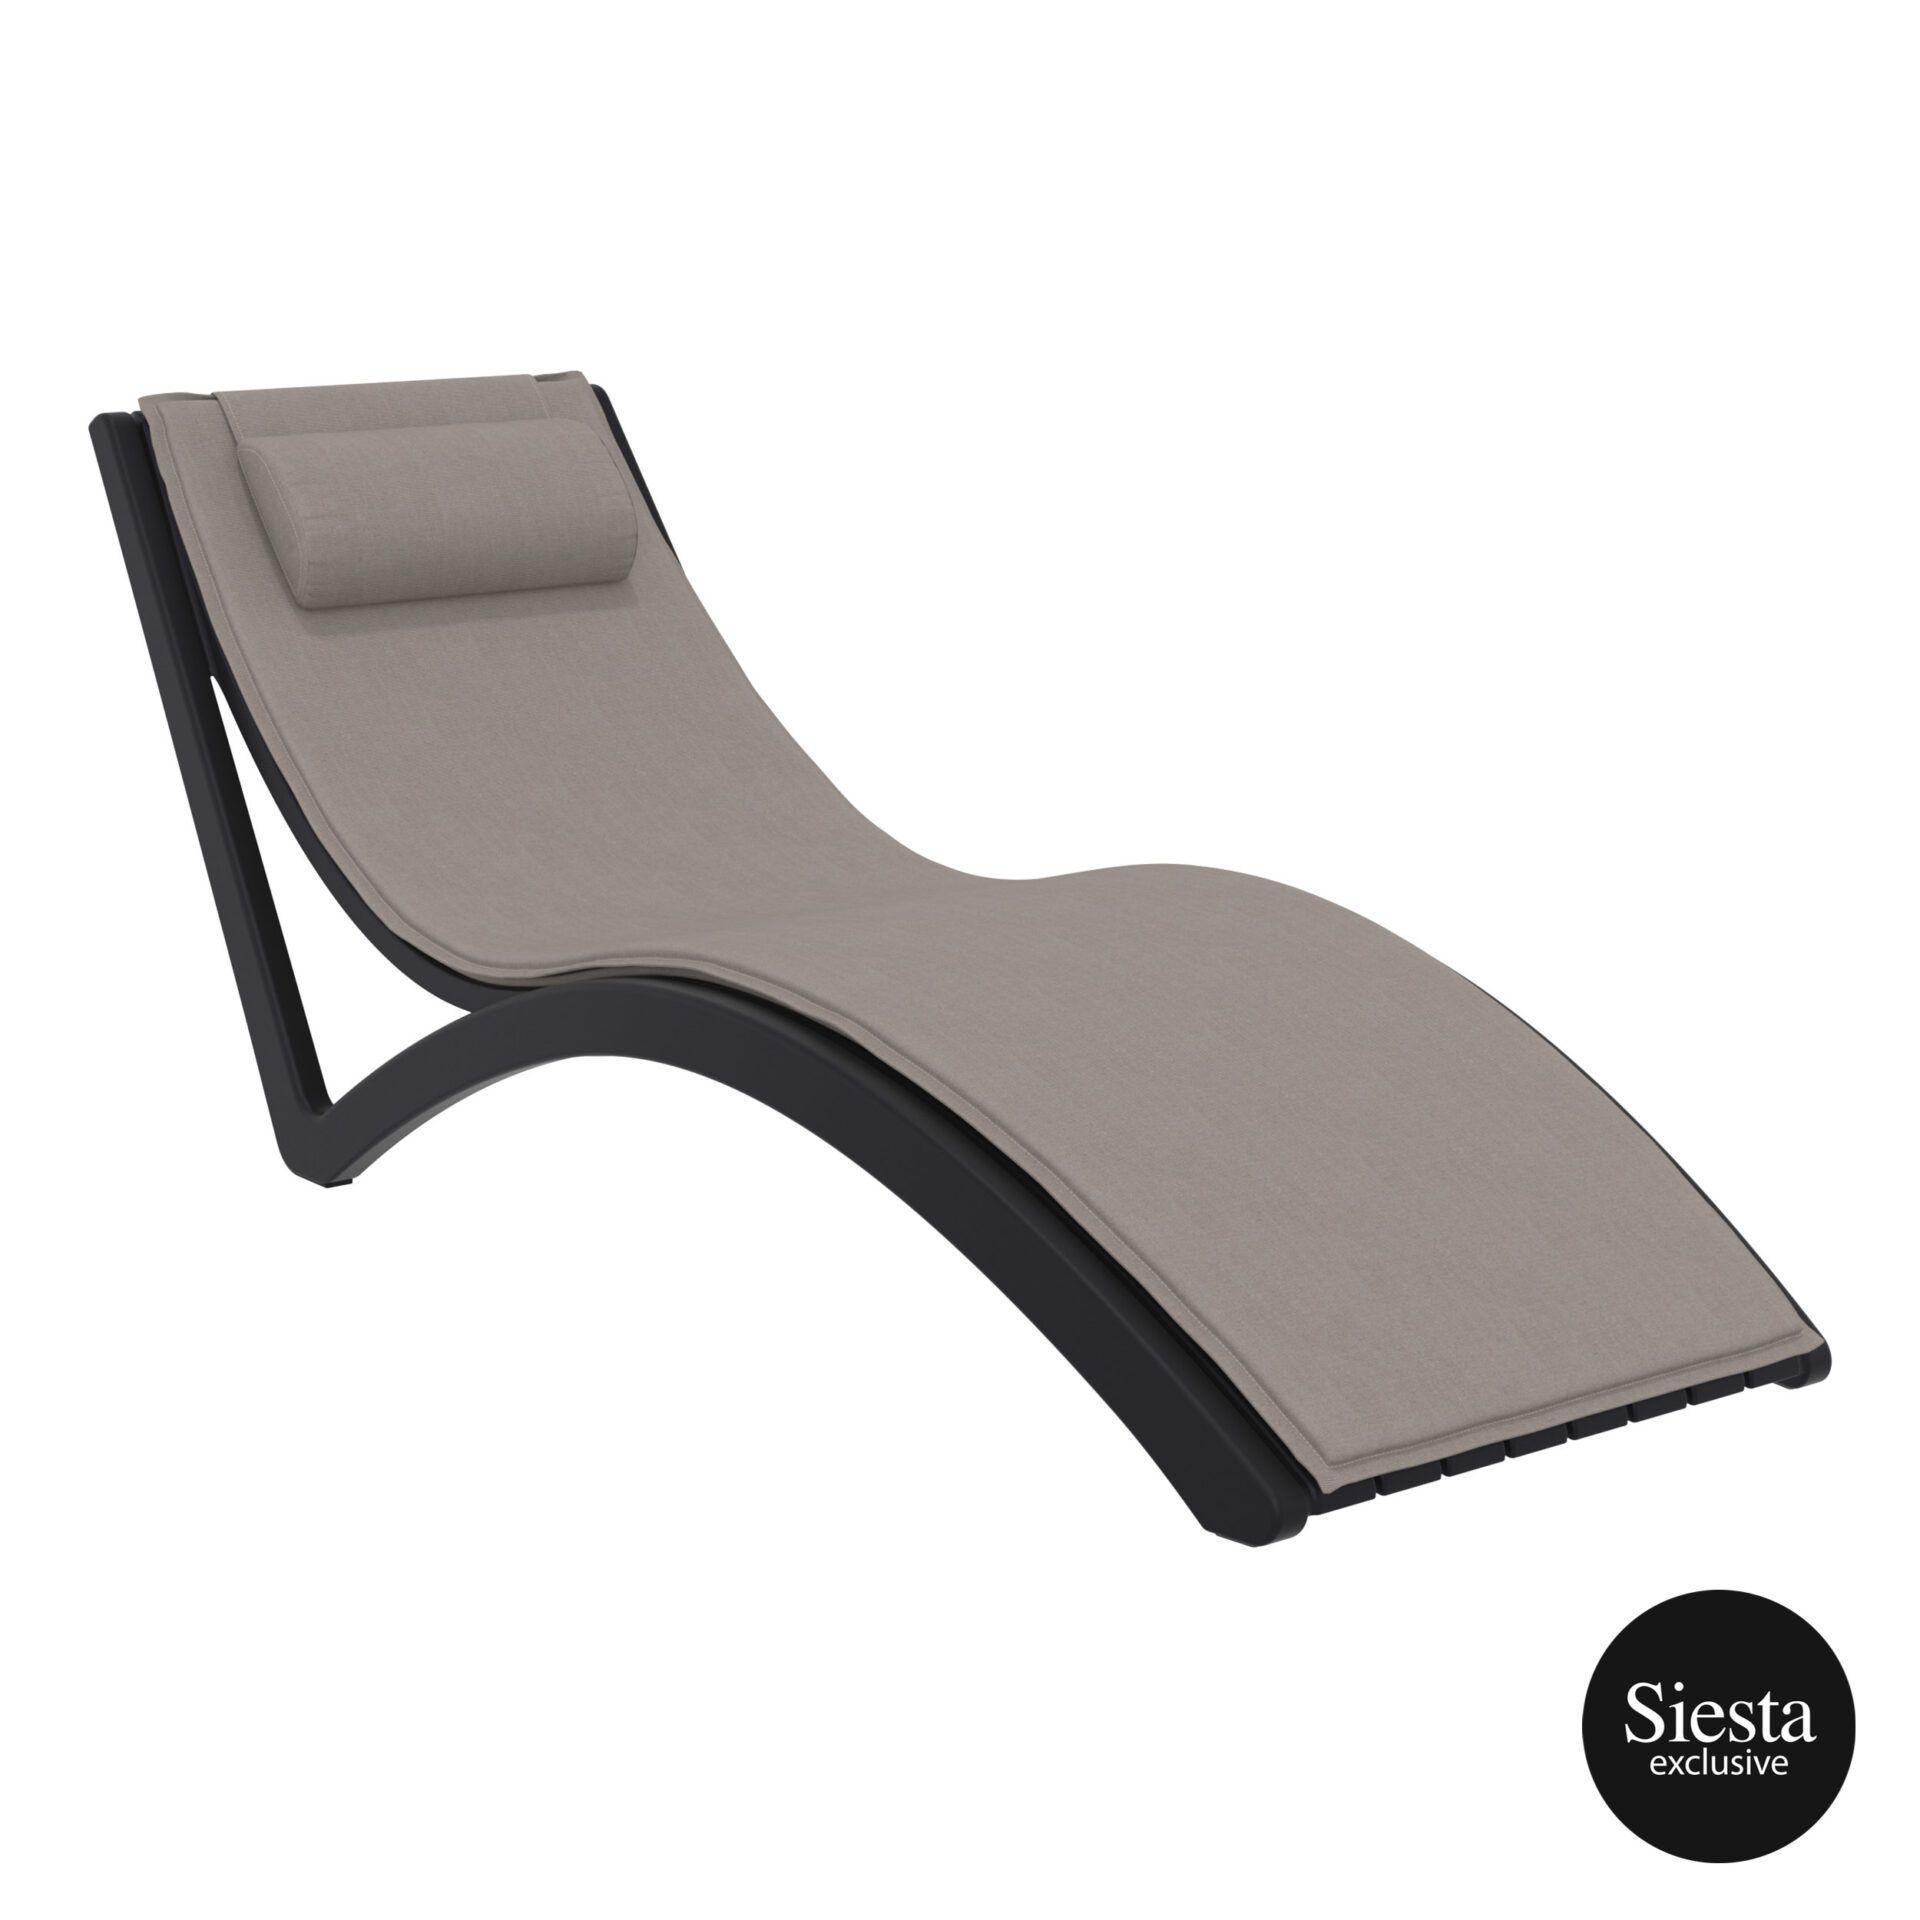 outdoor polypropylene slim sunlounger pillow cushion black brown front side